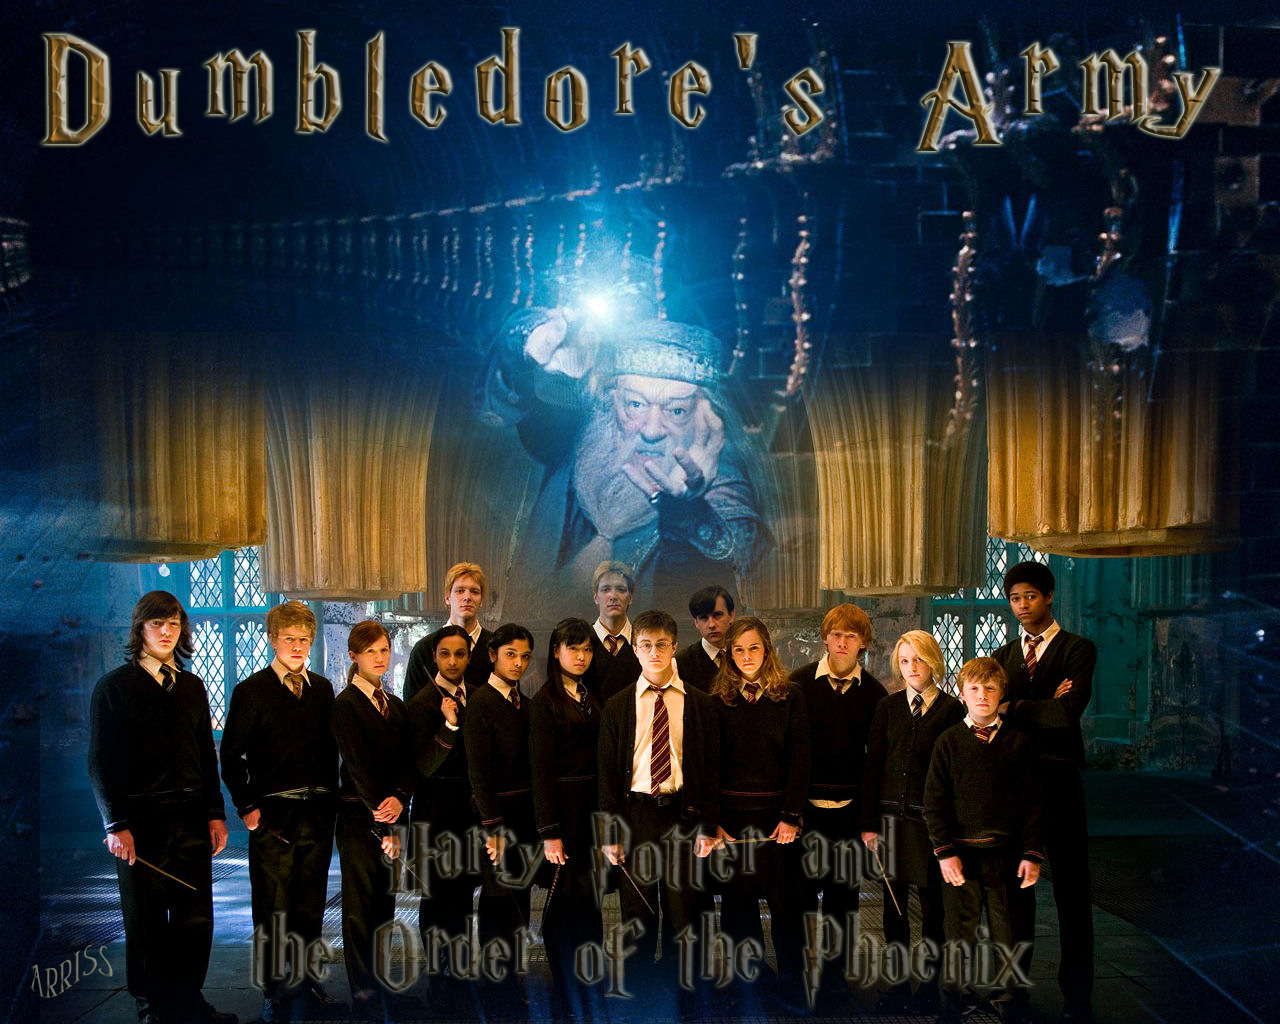 Image dumbledore s army jpg jpg harry potter wiki fandom powered by wikia